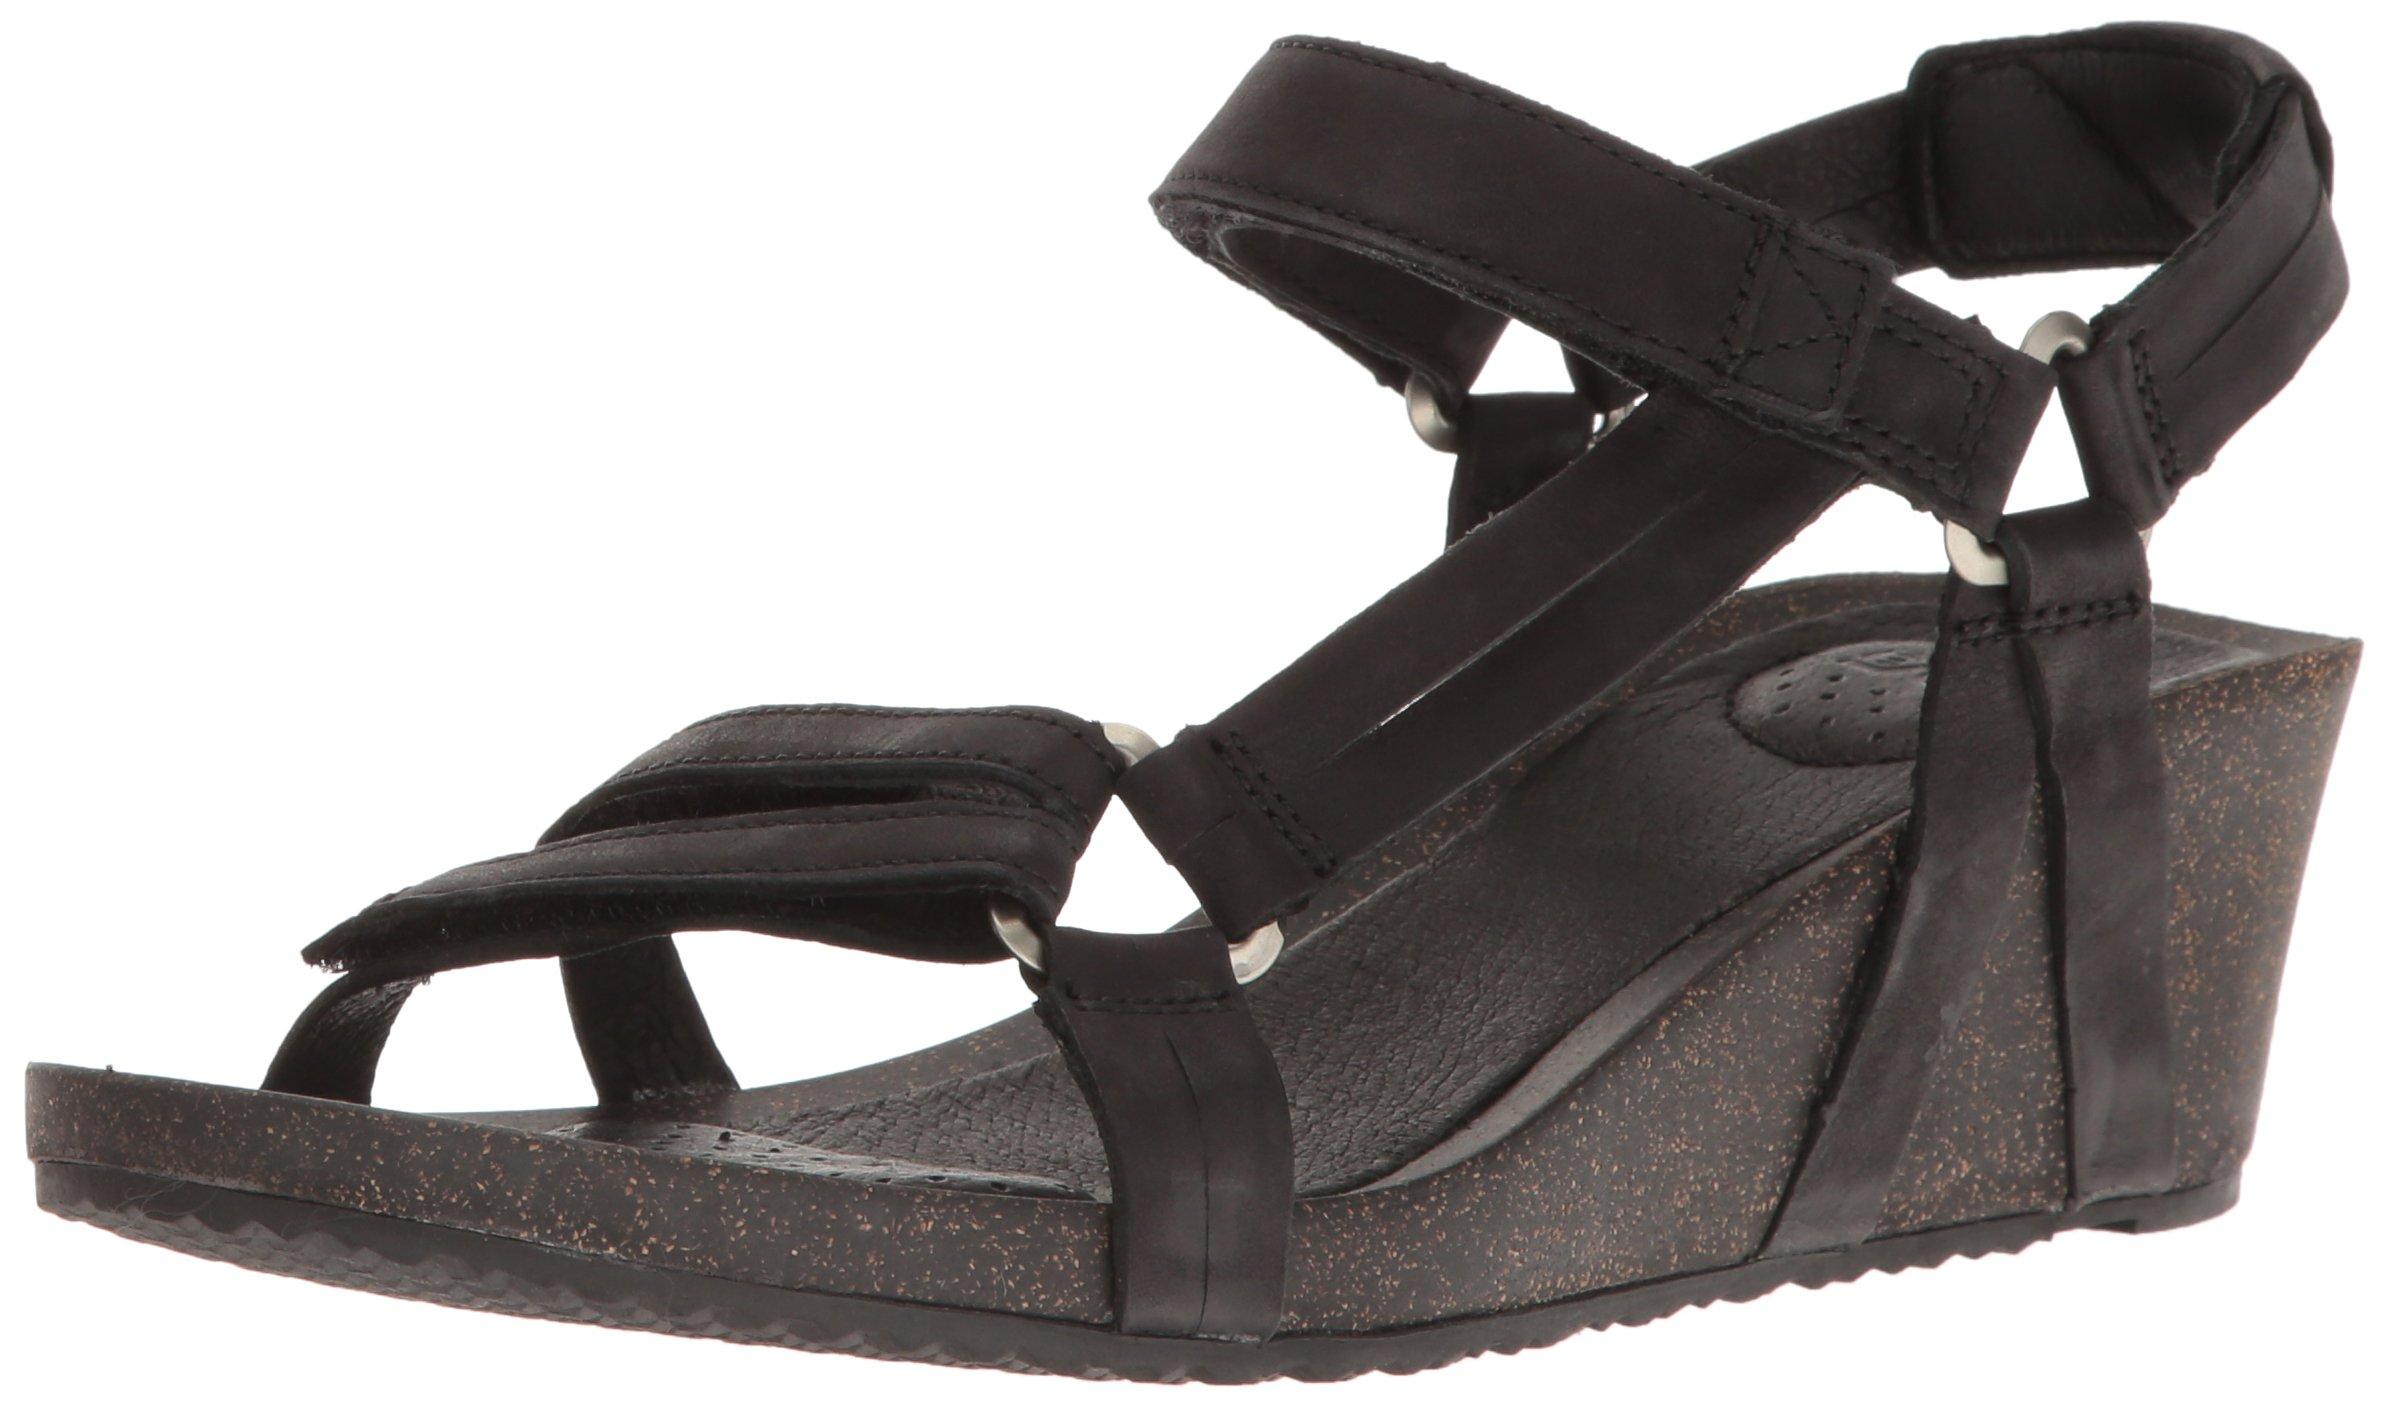 Teva Women's W Ysidro Universal Wedge Sandal, Black, 8 M US by Teva